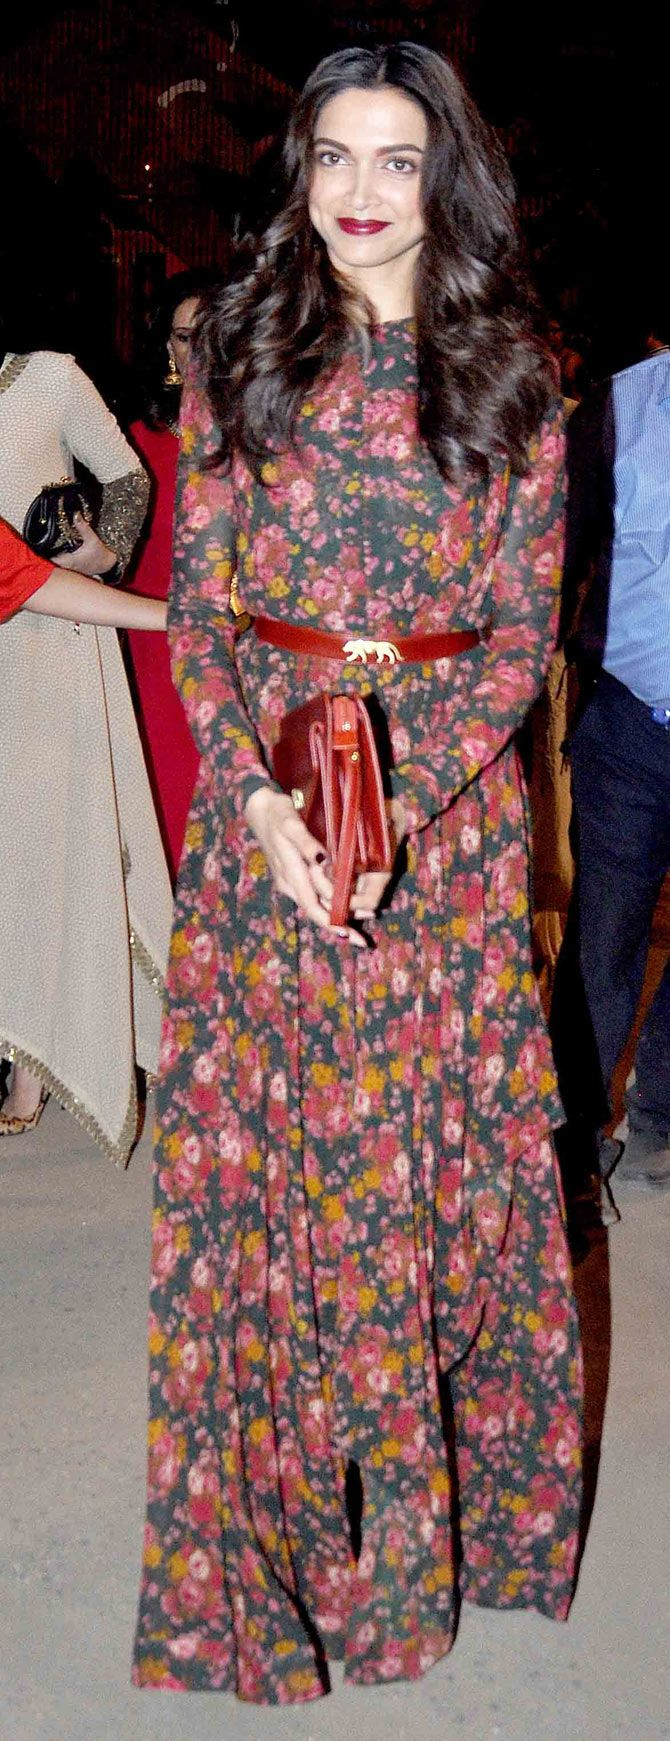 Deepika Padukone in Sabyasachi Mukherjee  at the Lakme Fashion Week Summer/Resort 2015 curtain raiser.